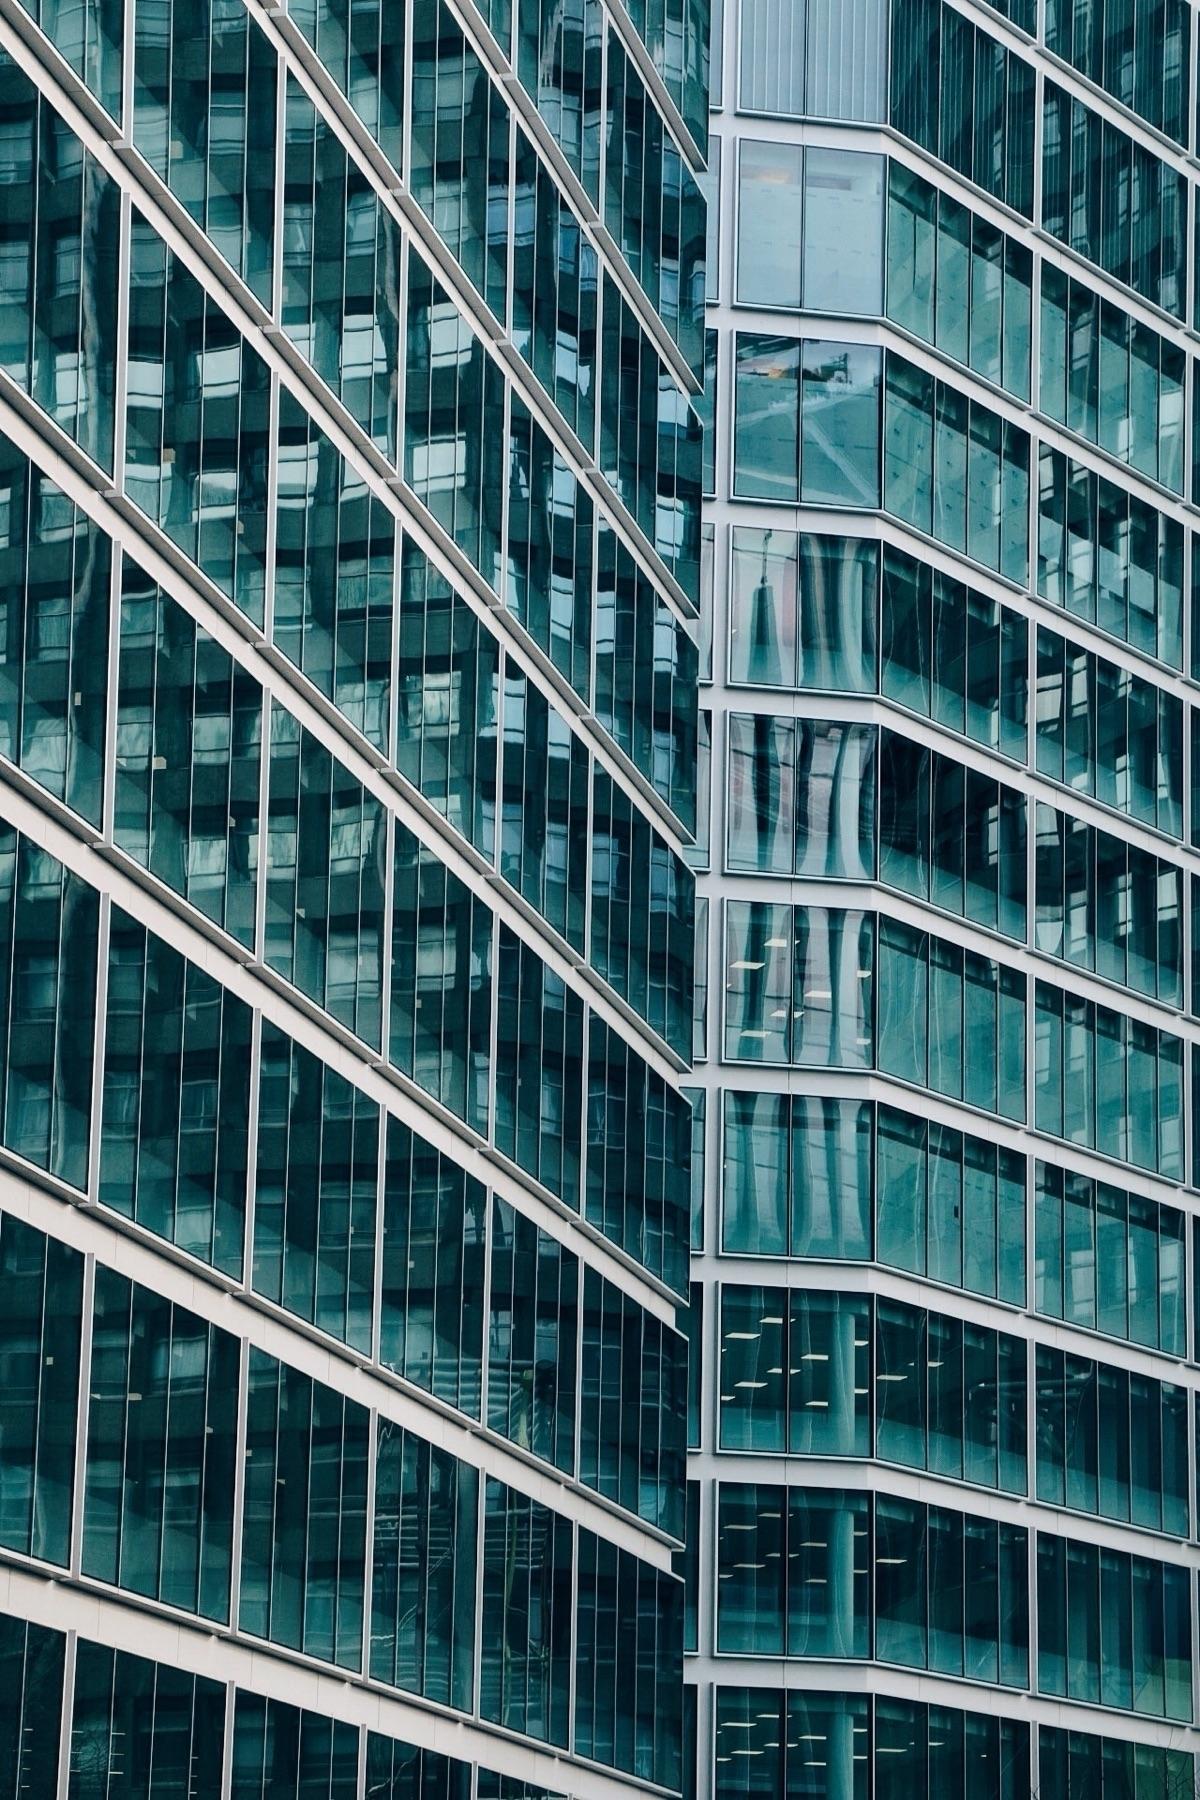 photography, architecture, minimal - rafaelschunck | ello